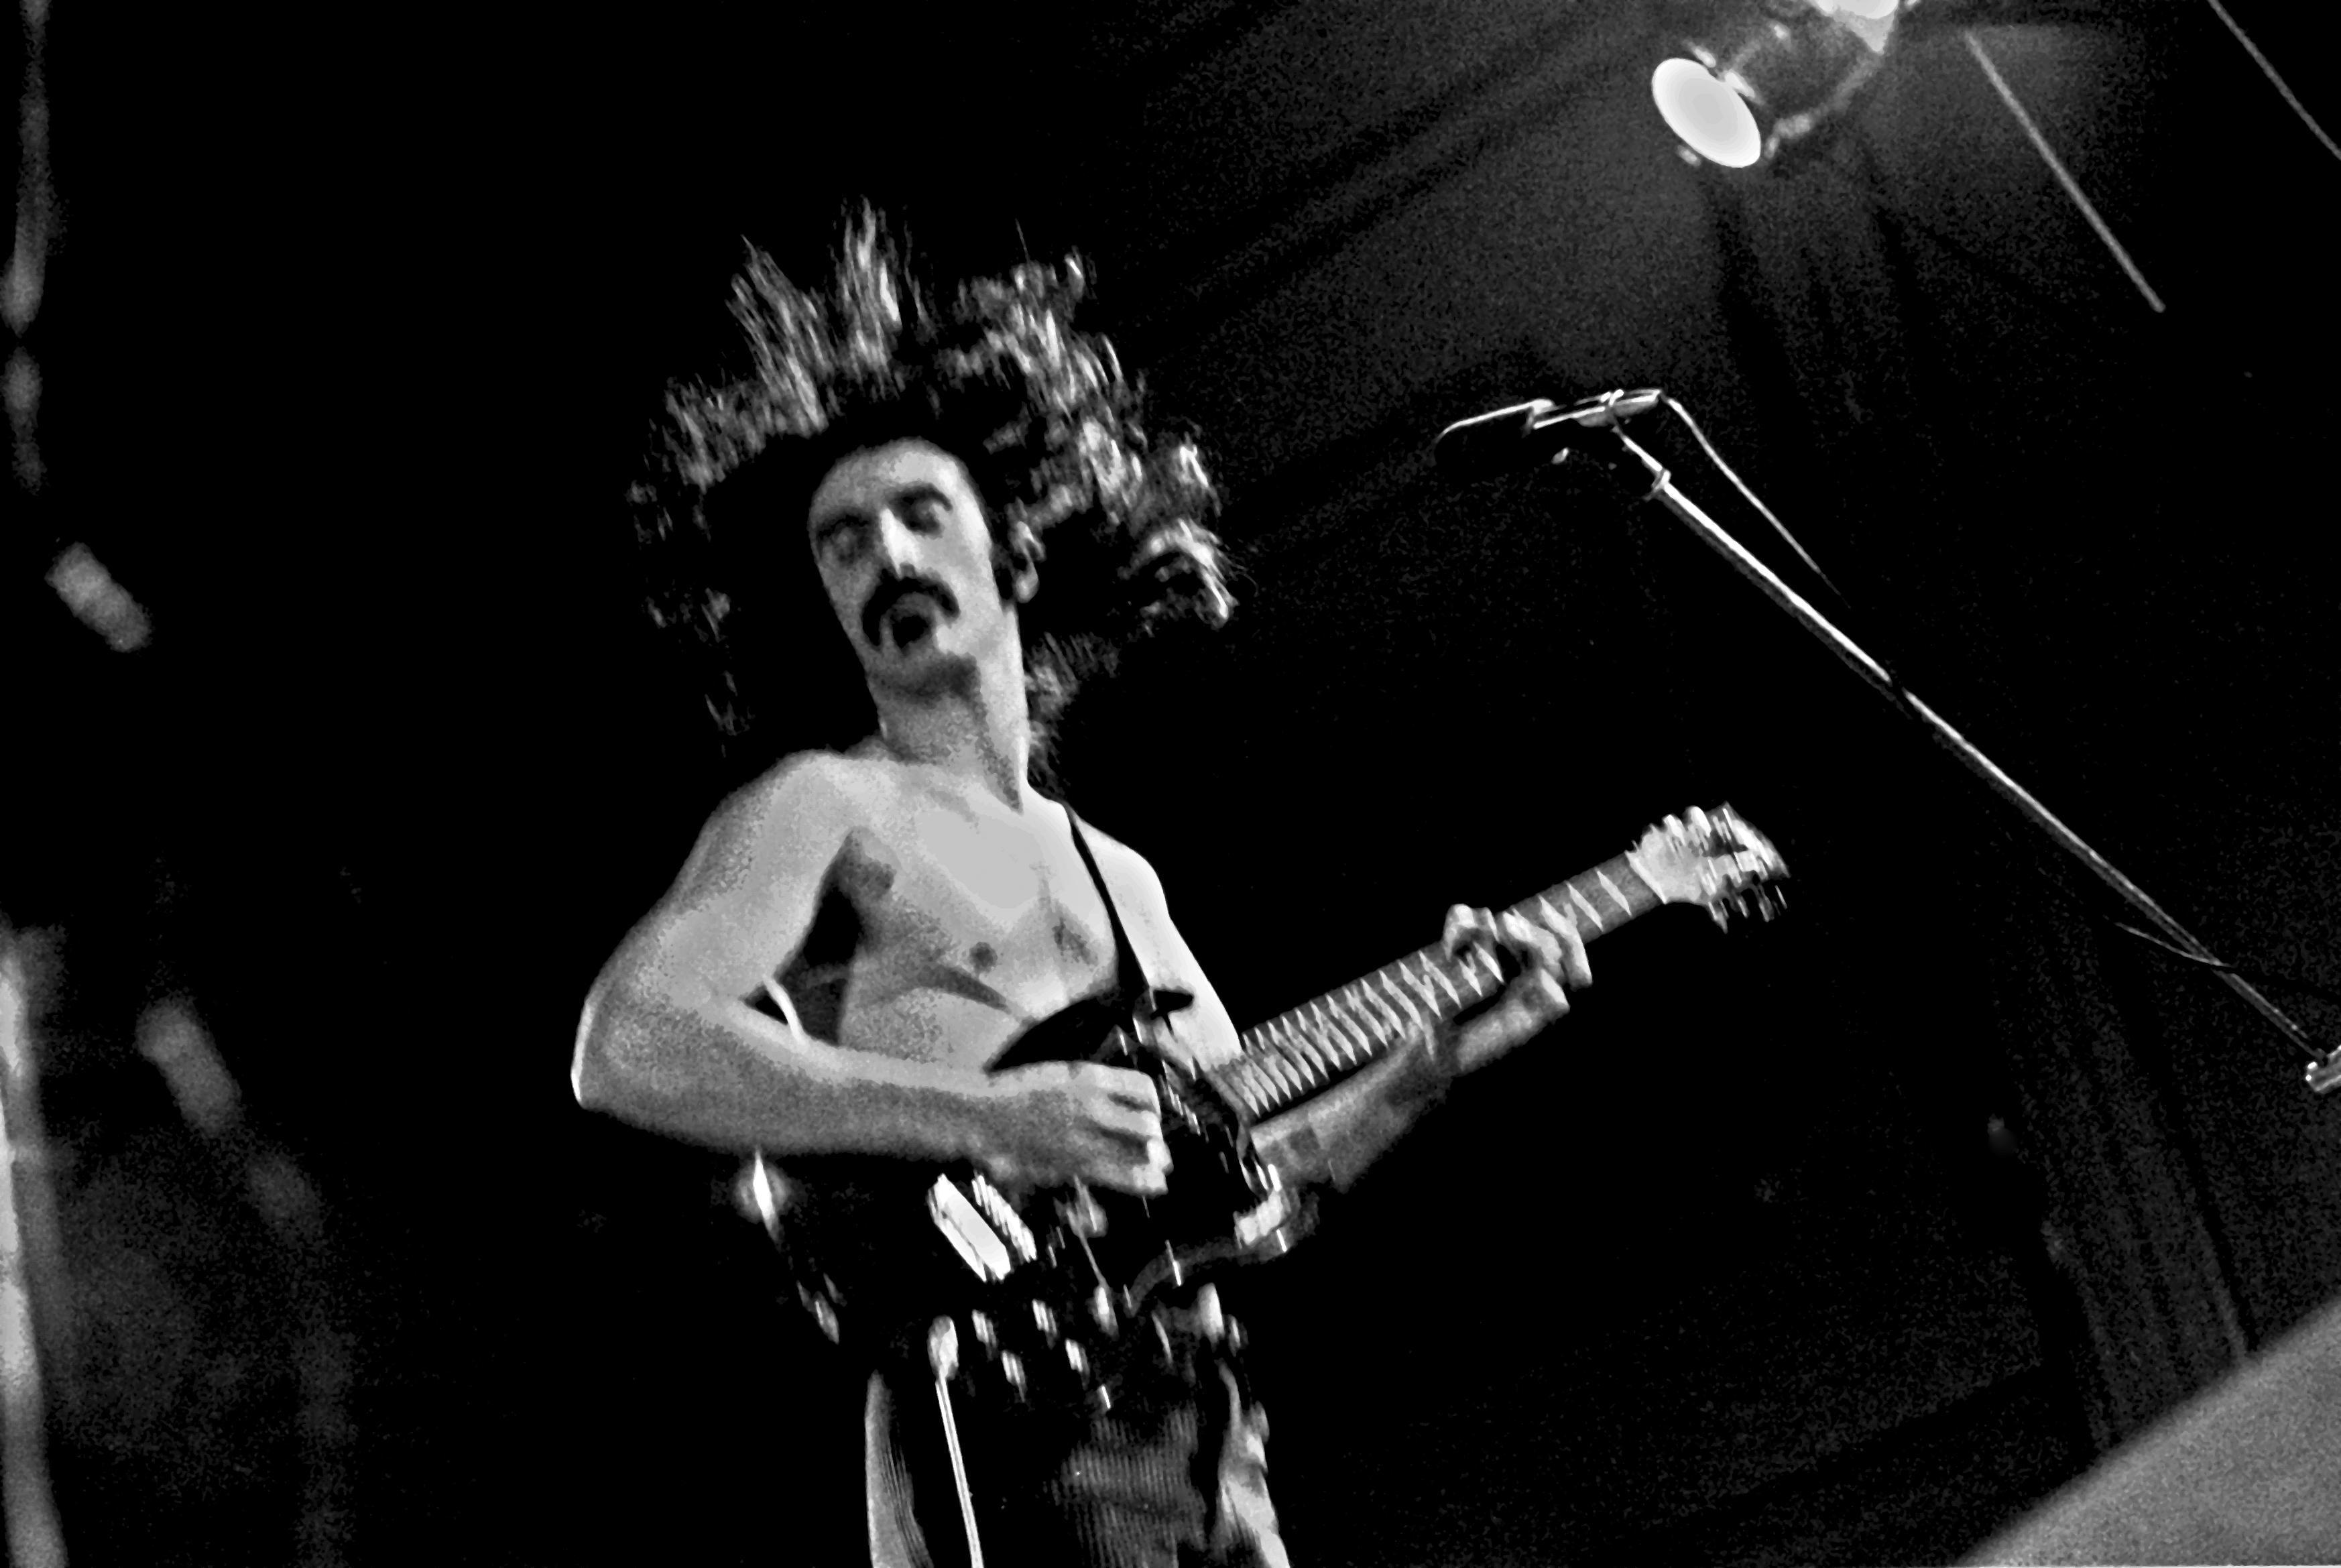 Frank Zappa in glory